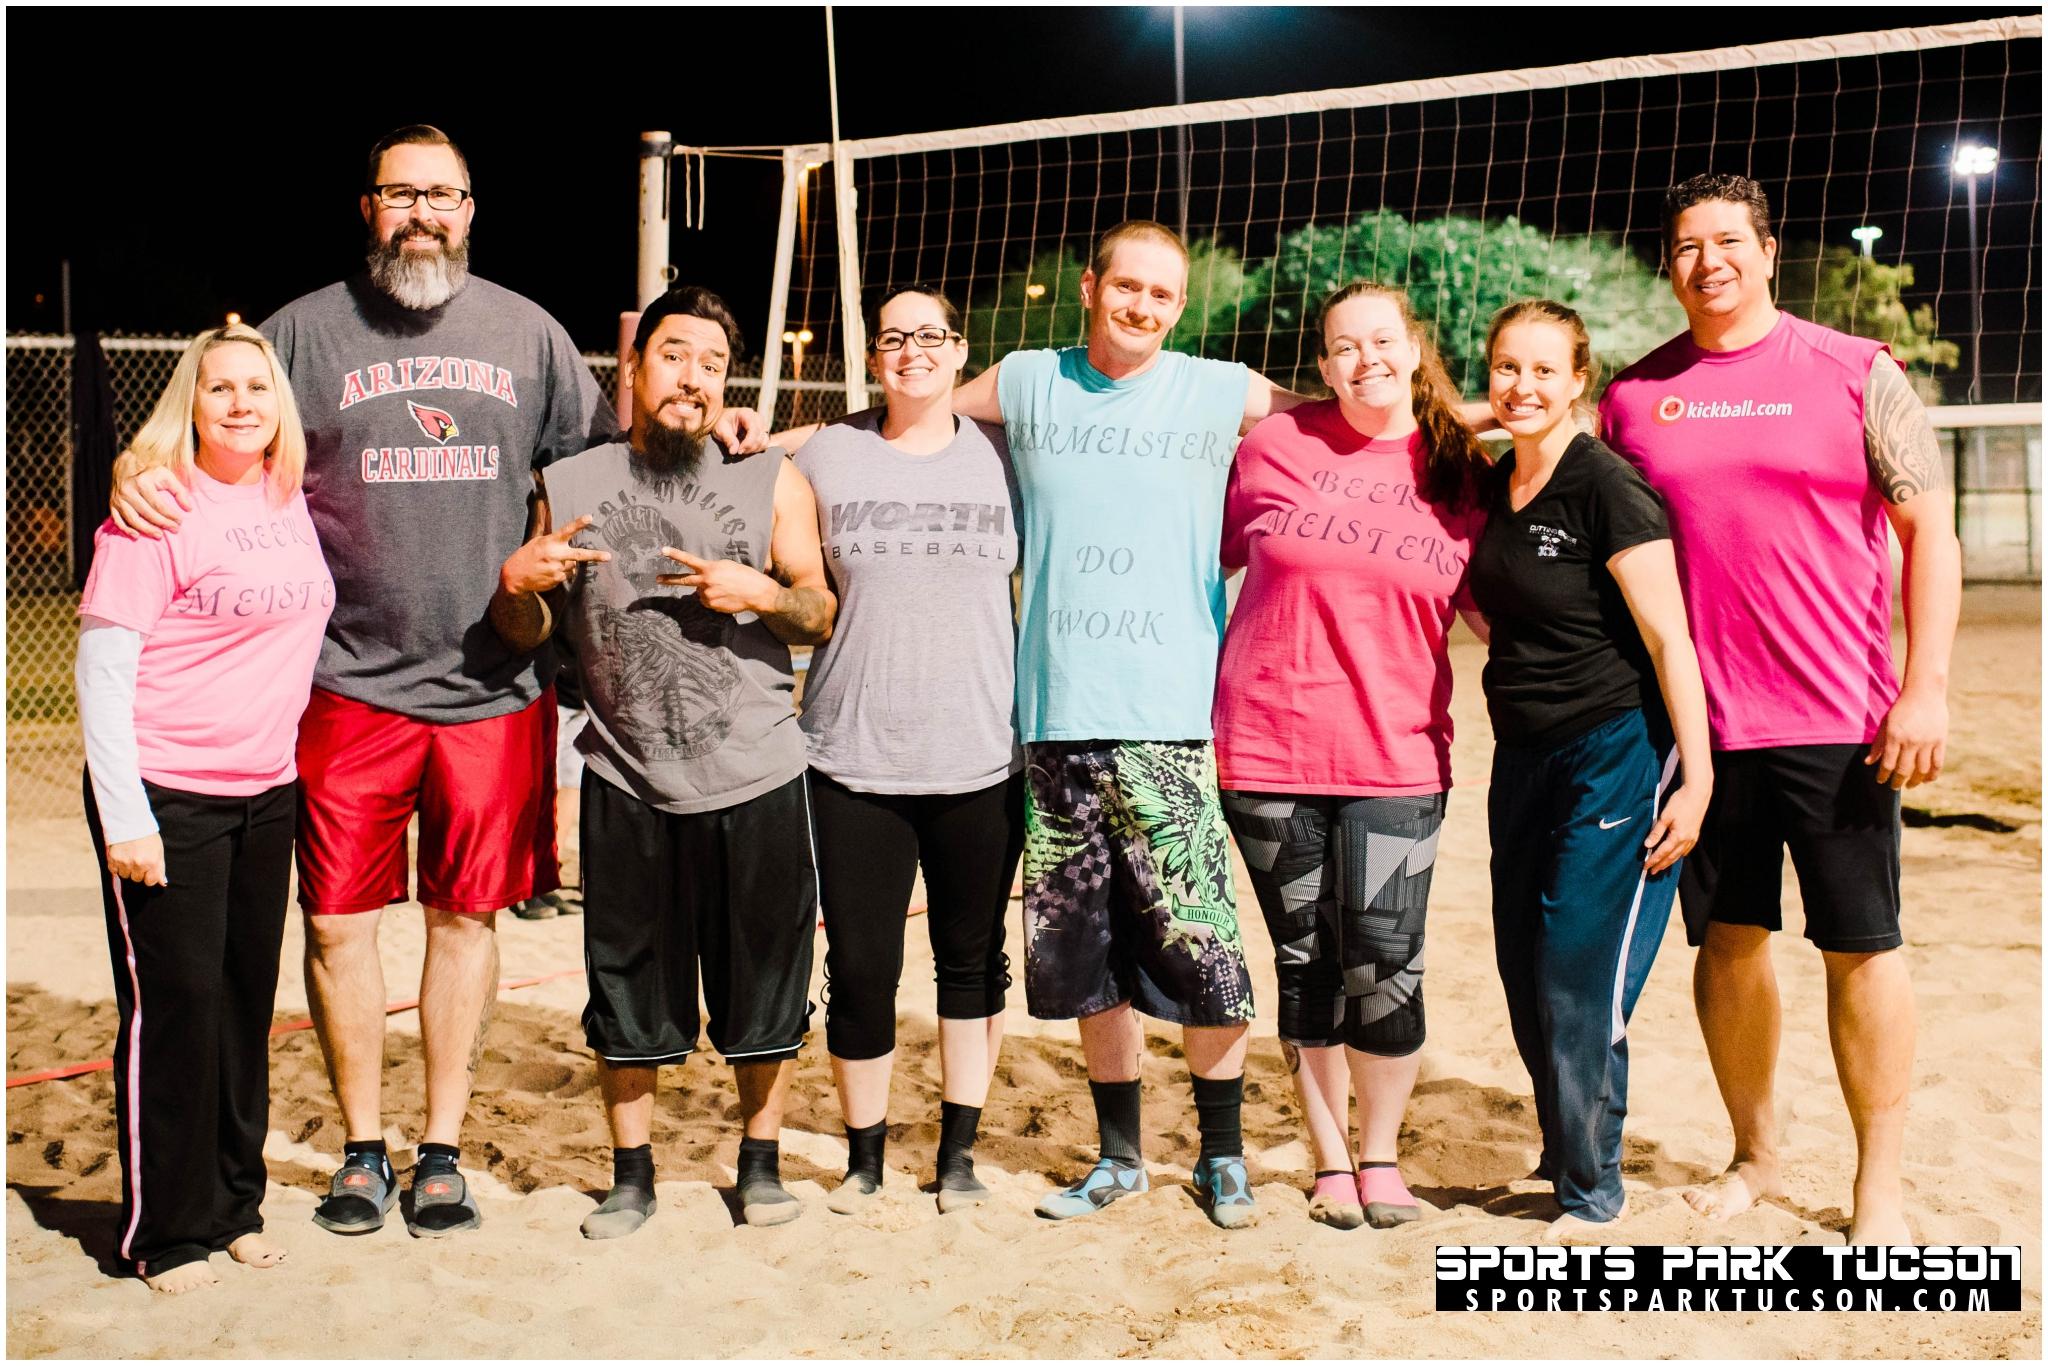 Volleyball Fri Co-ed 6v6 - C, Team: Beermeisters